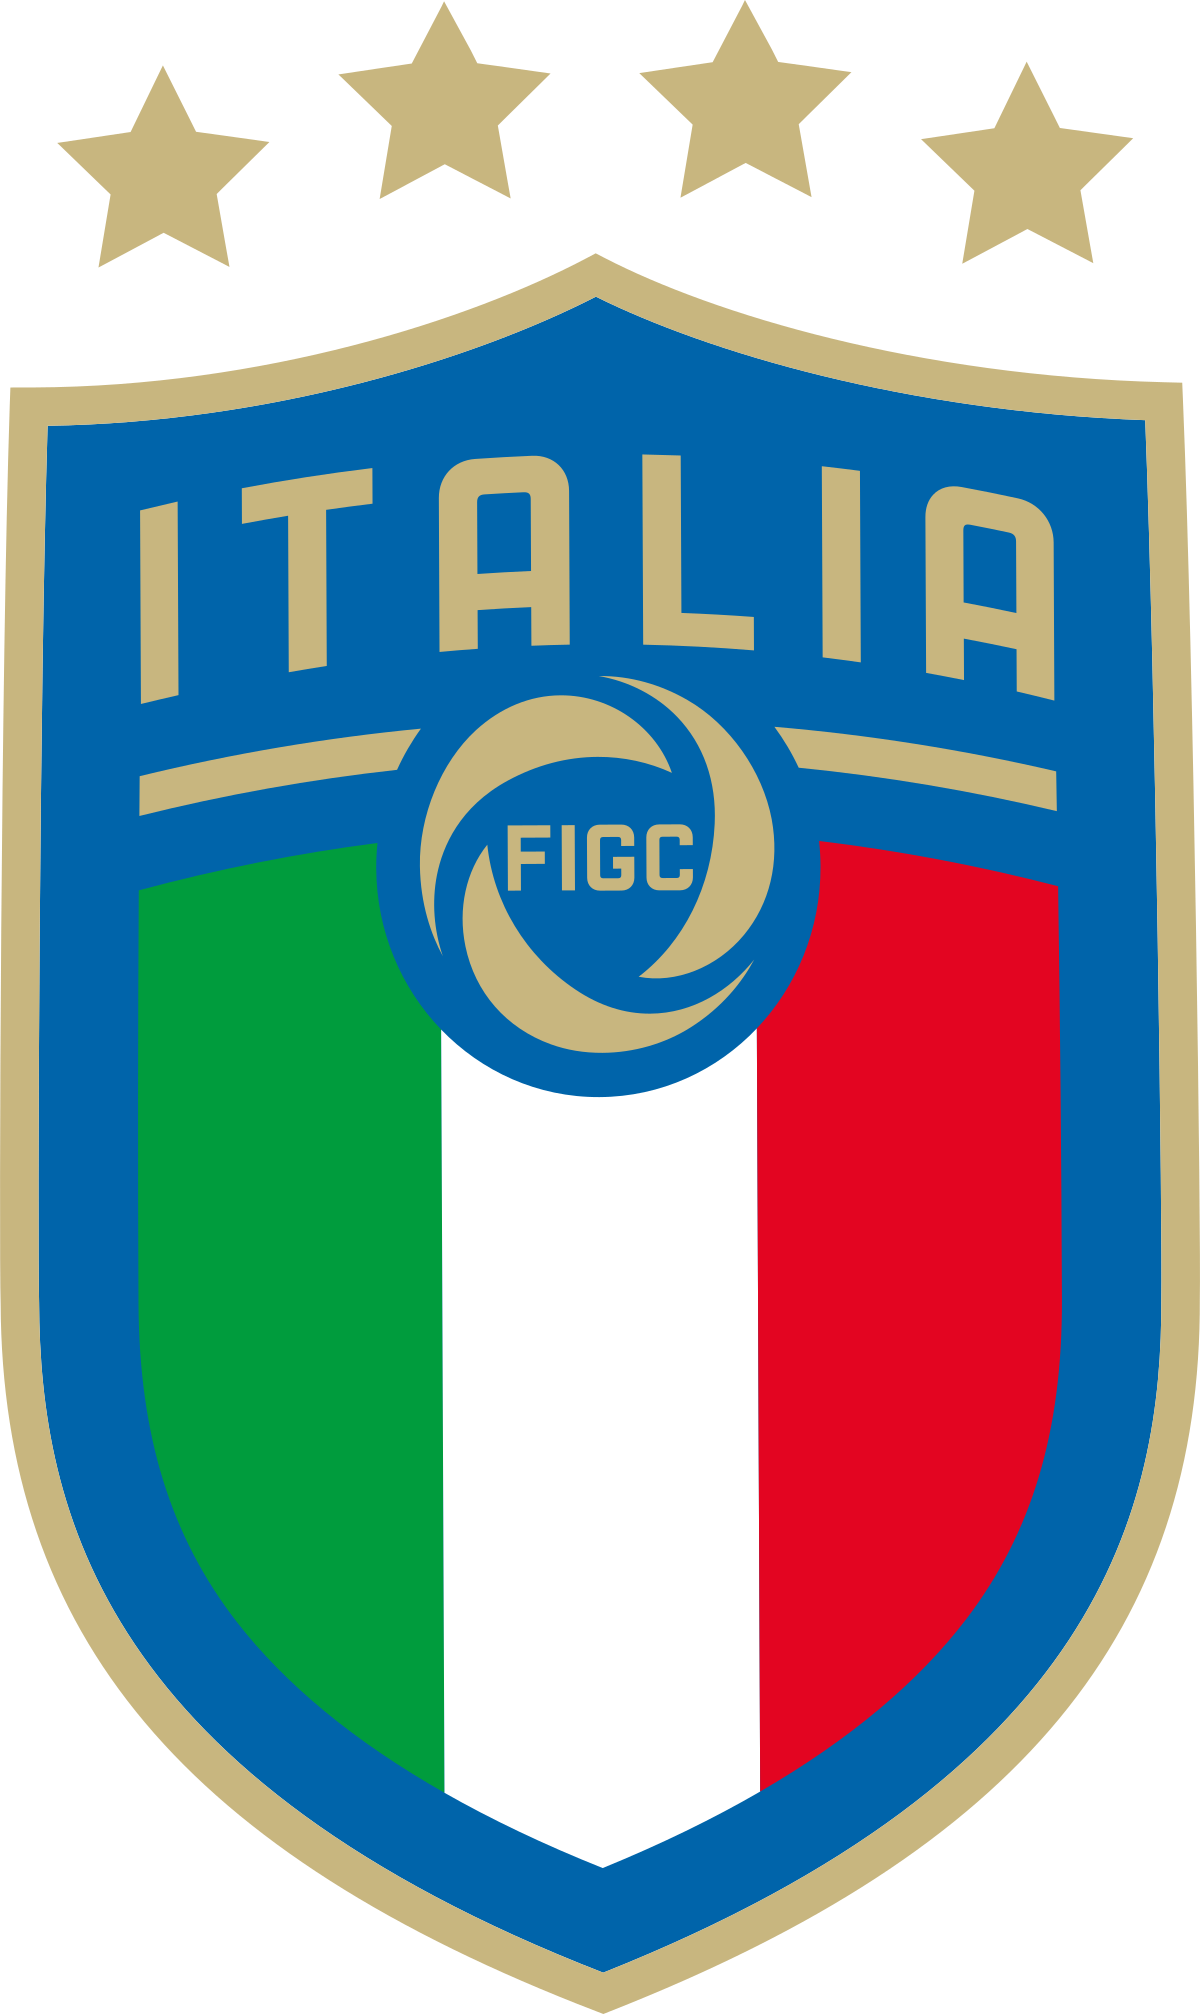 Italian Football League Google Search Italy National Football Team Football Team Logos National Football Teams